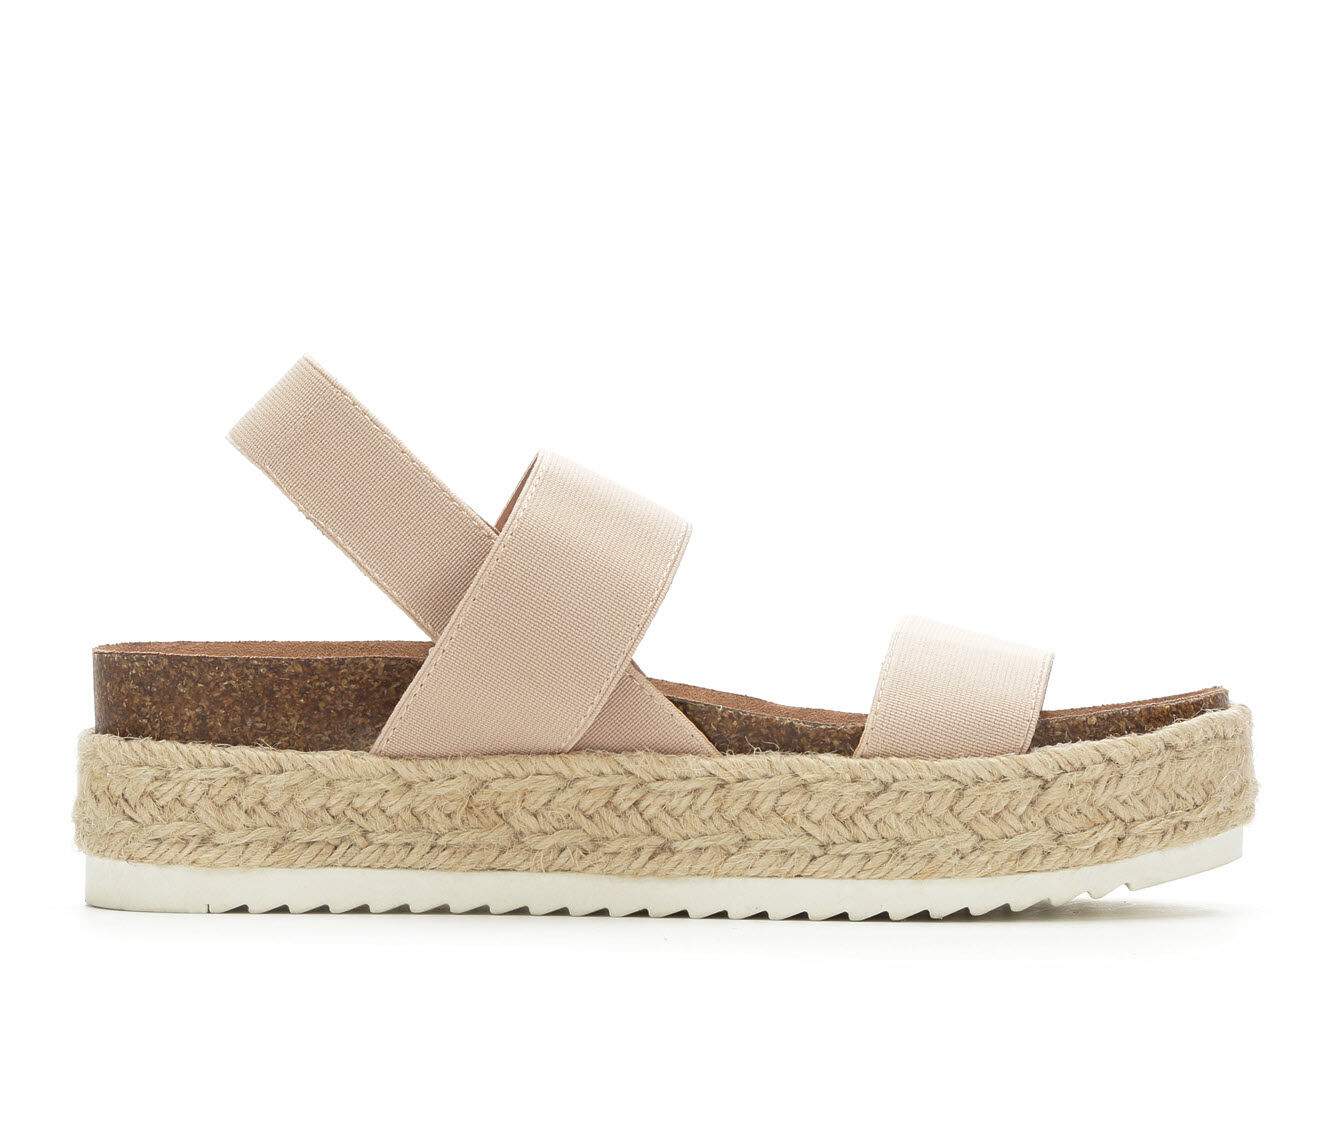 Madden Girl Cybell Flatform Sandals